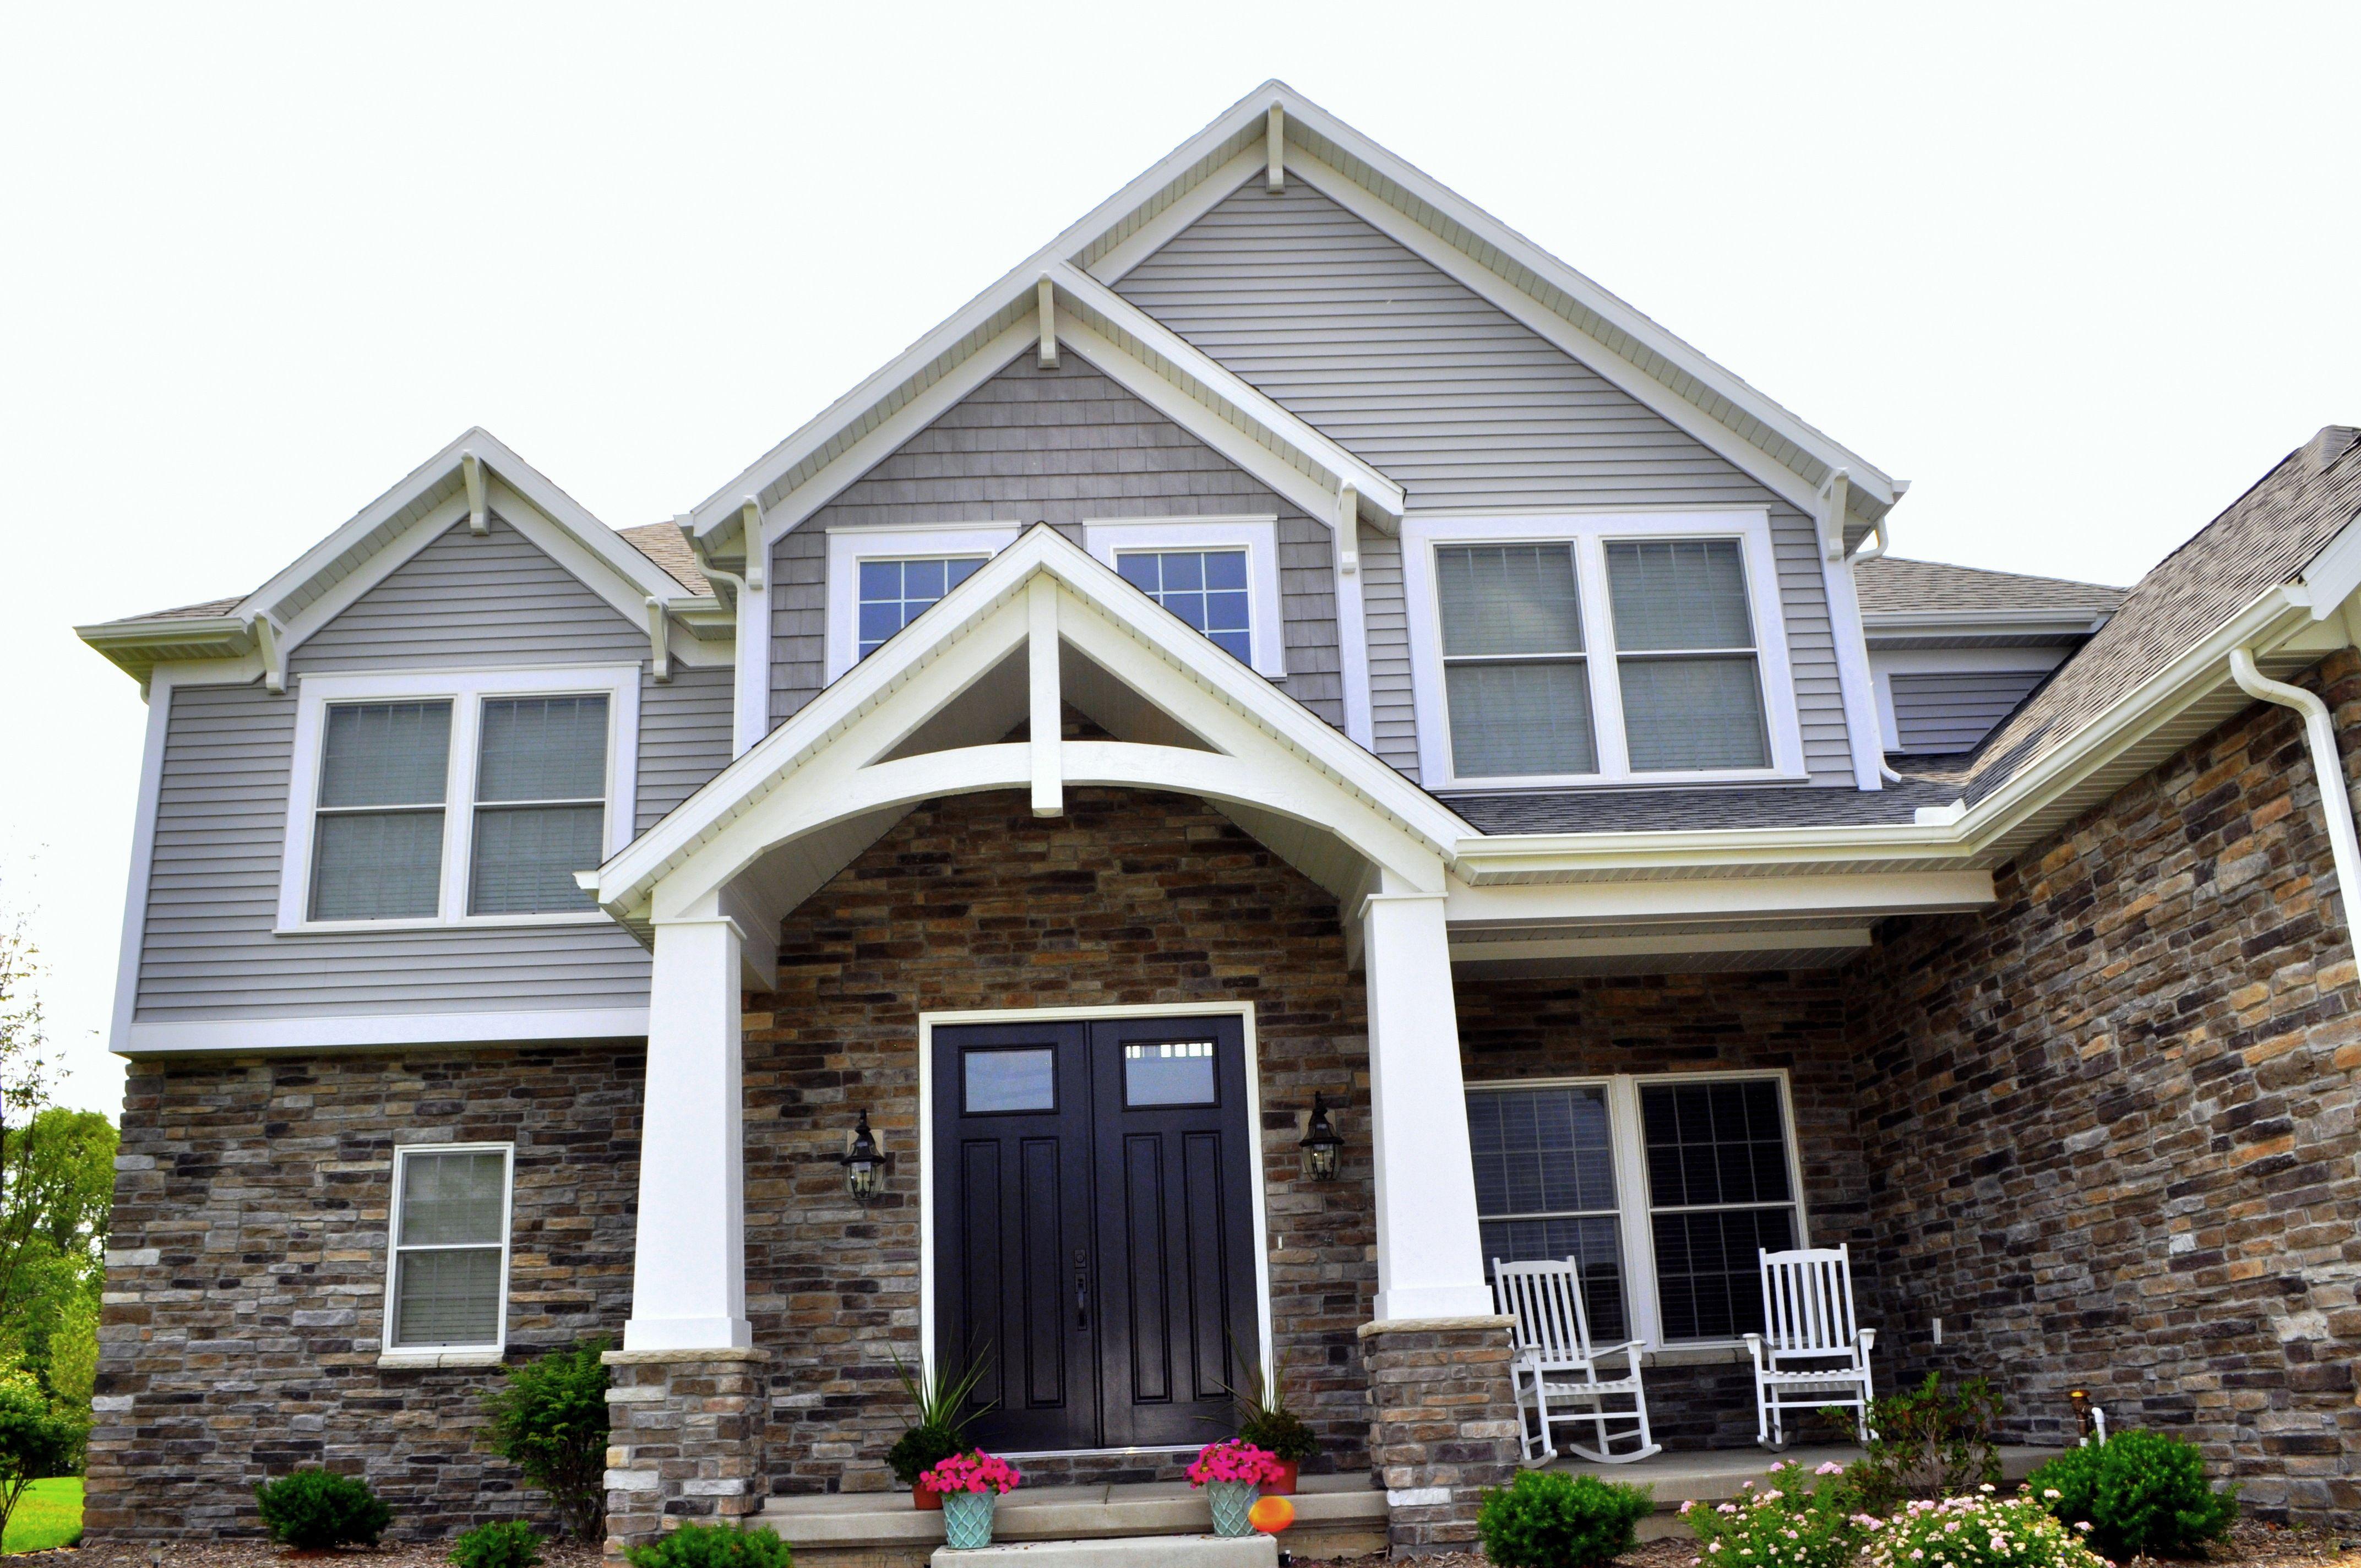 Stone Exteriors For Homes stoned exterior home bucks creek laytite jn stone | stone style